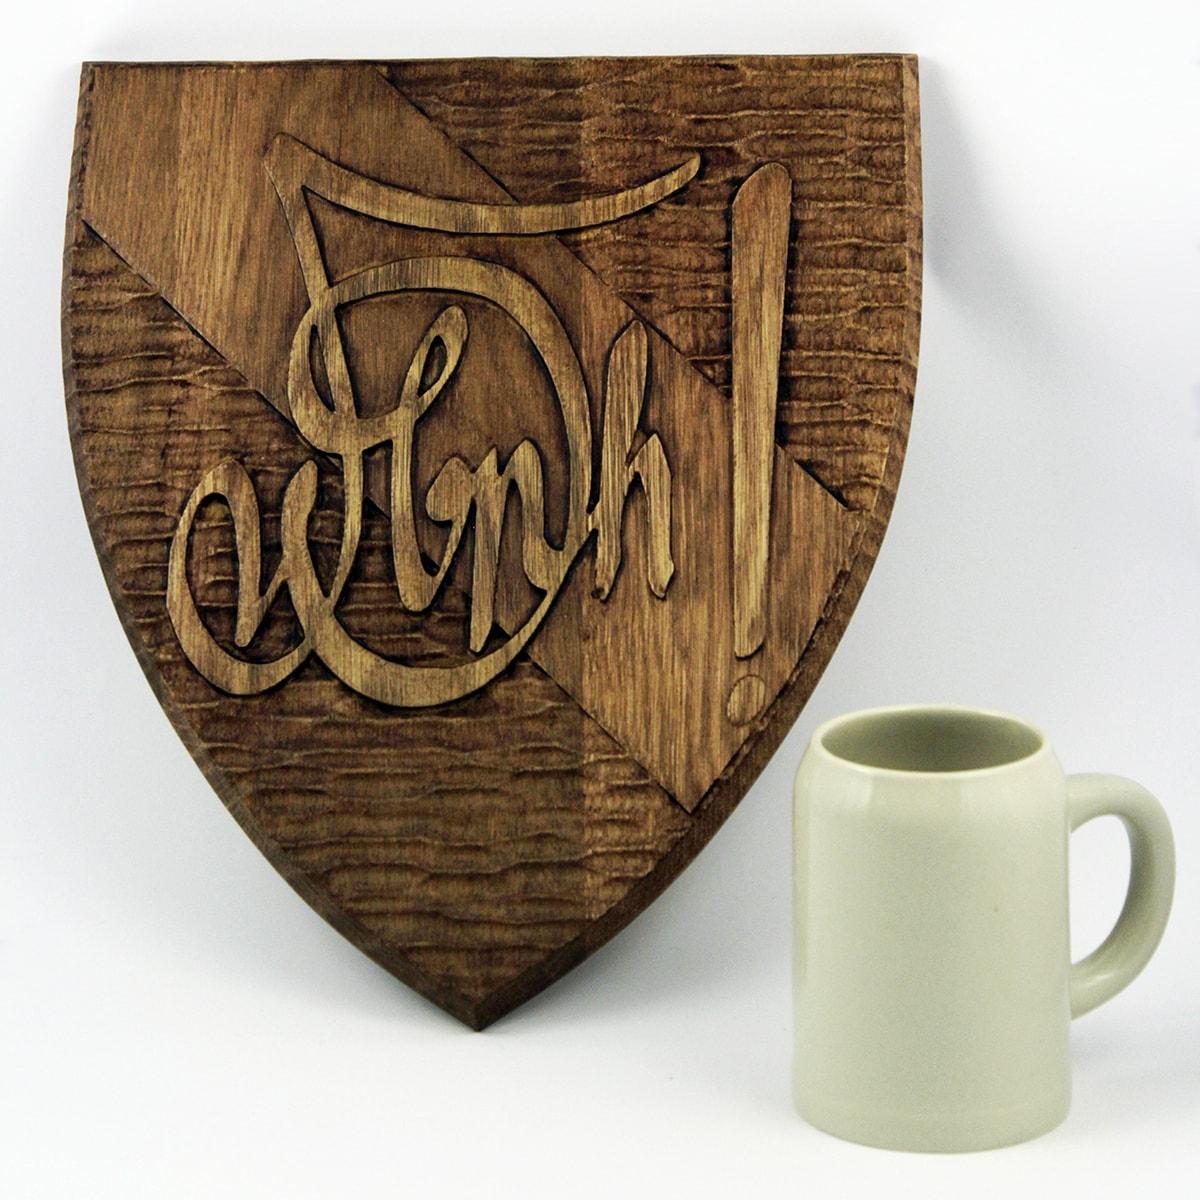 Zirkelschild aus Holz